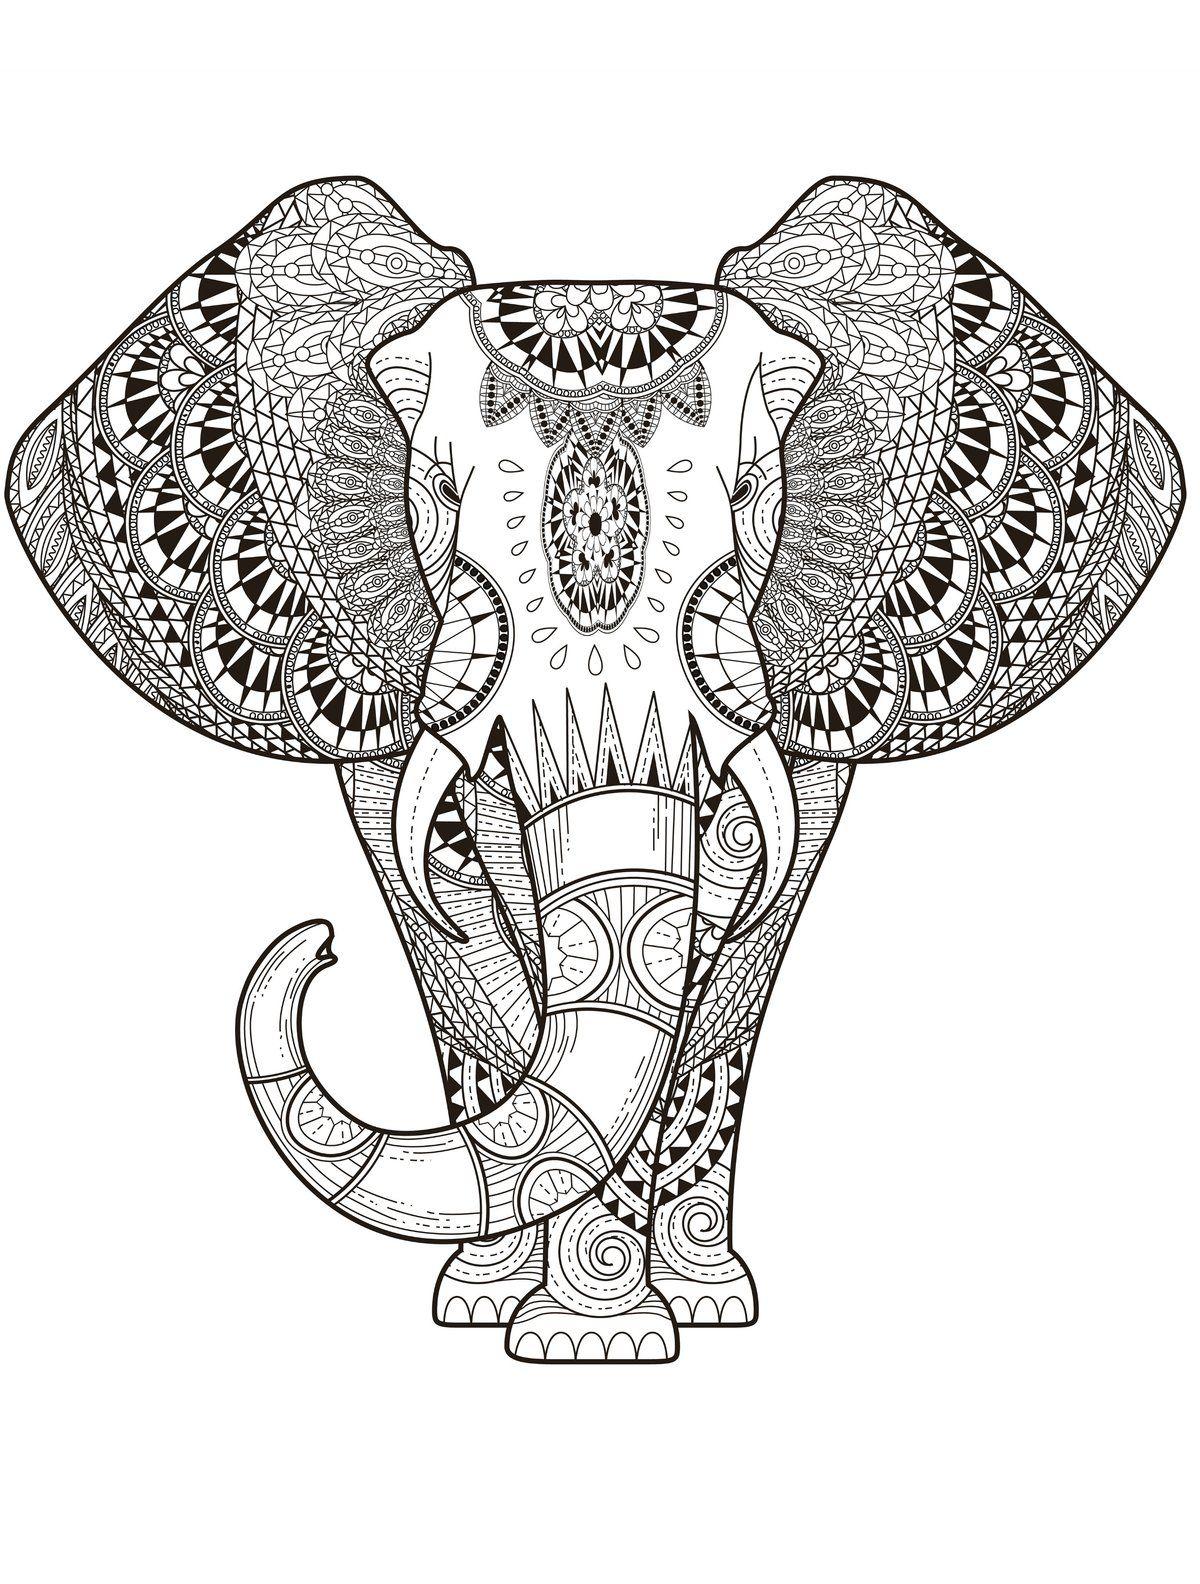 Raskraska Antistress Slon 색칠책 젠탱글 패턴 패턴